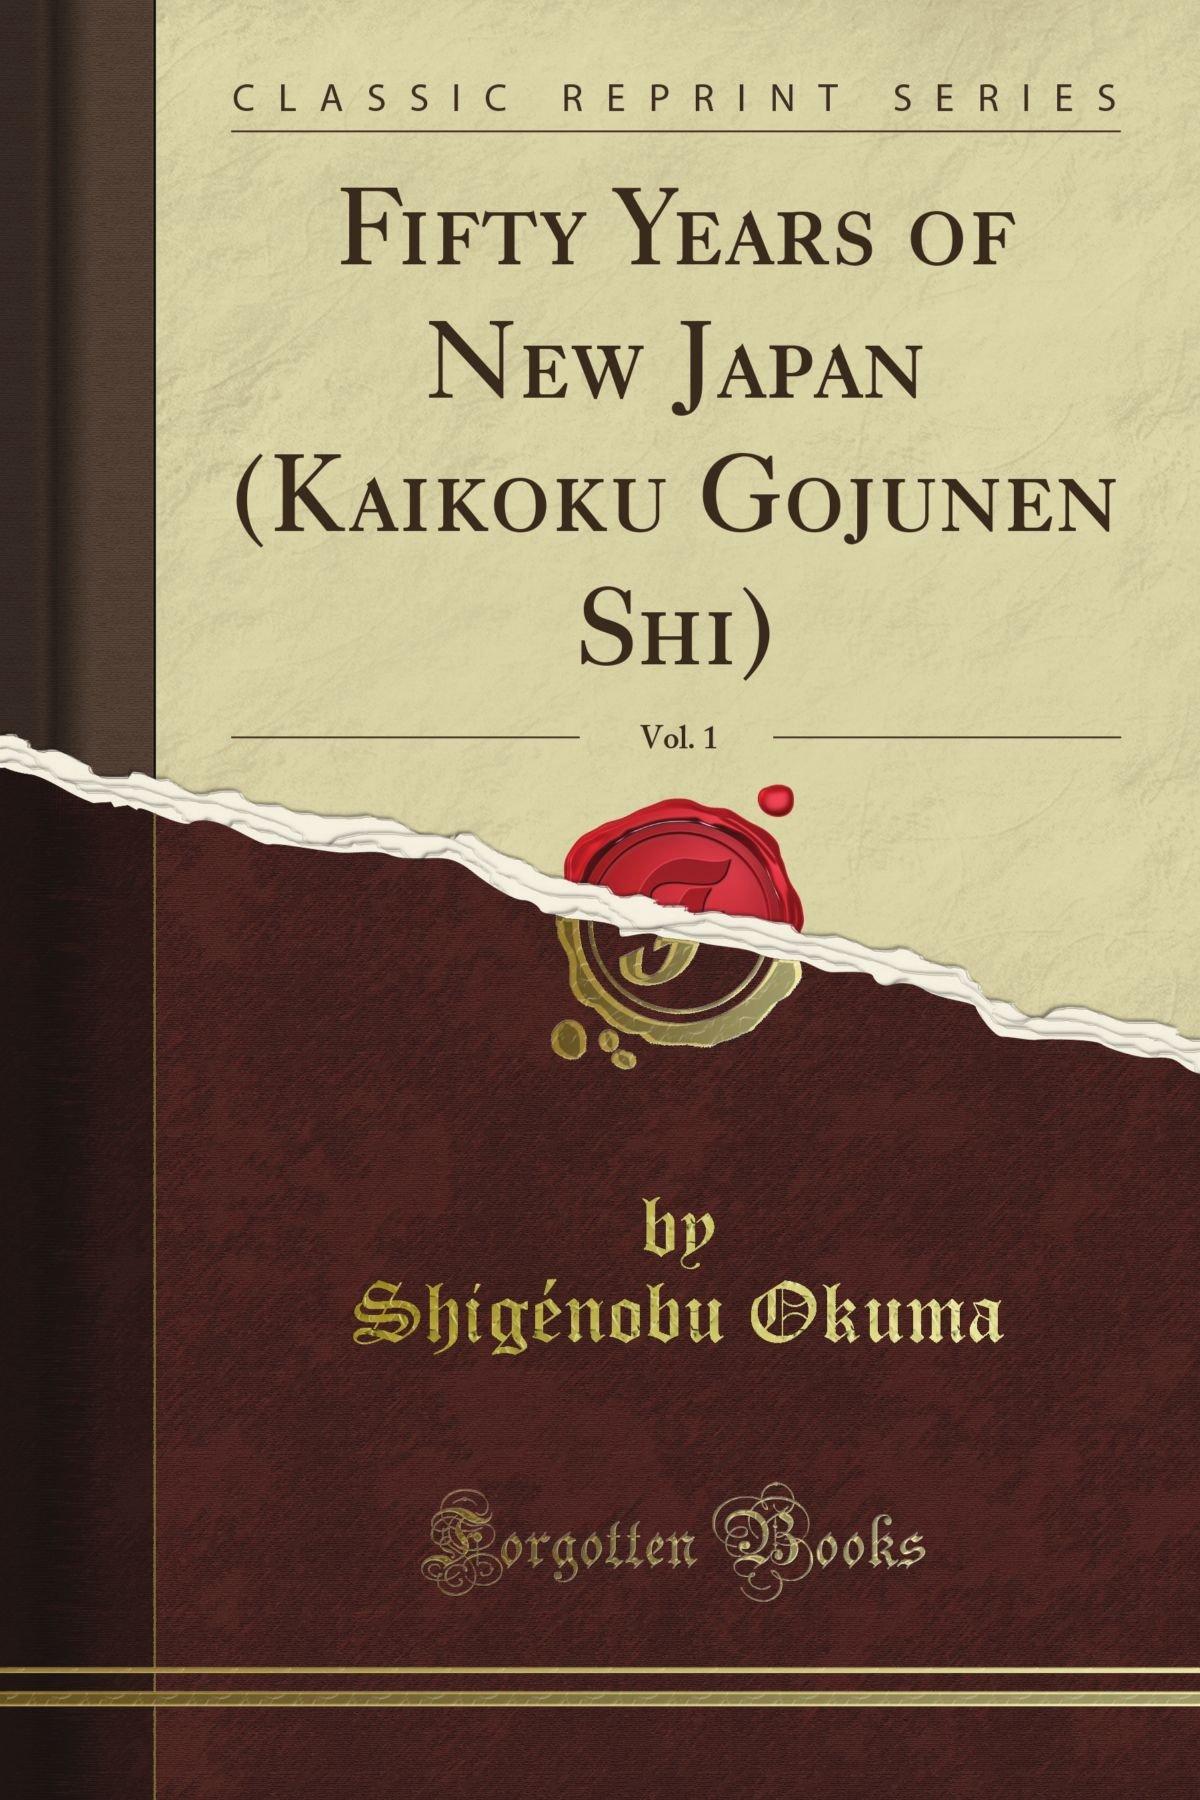 Fifty Years of New Japan (Kaikoku Gojunen Shi), Vol. 1 (Classic Reprint) pdf epub